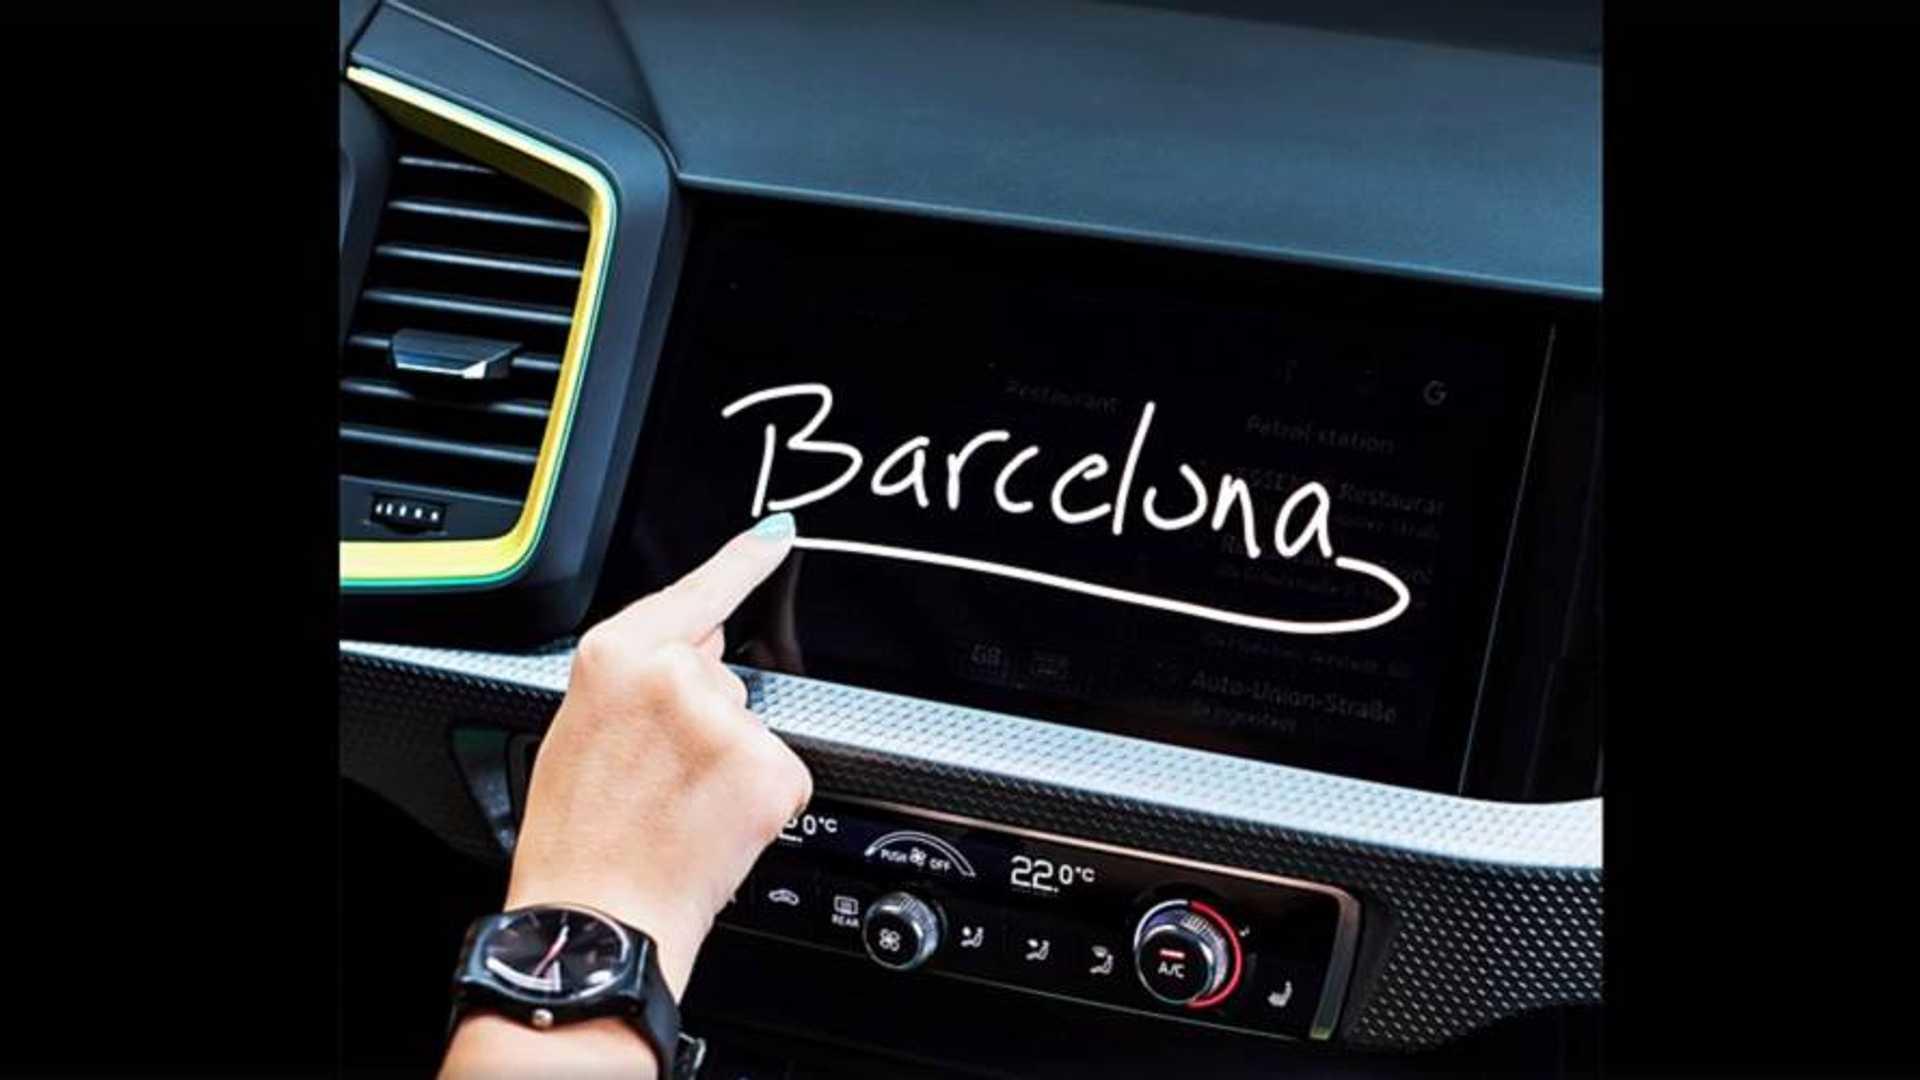 2019 Audi A1 First Teaser Confirms Virtual Cockpit, MMI Touch